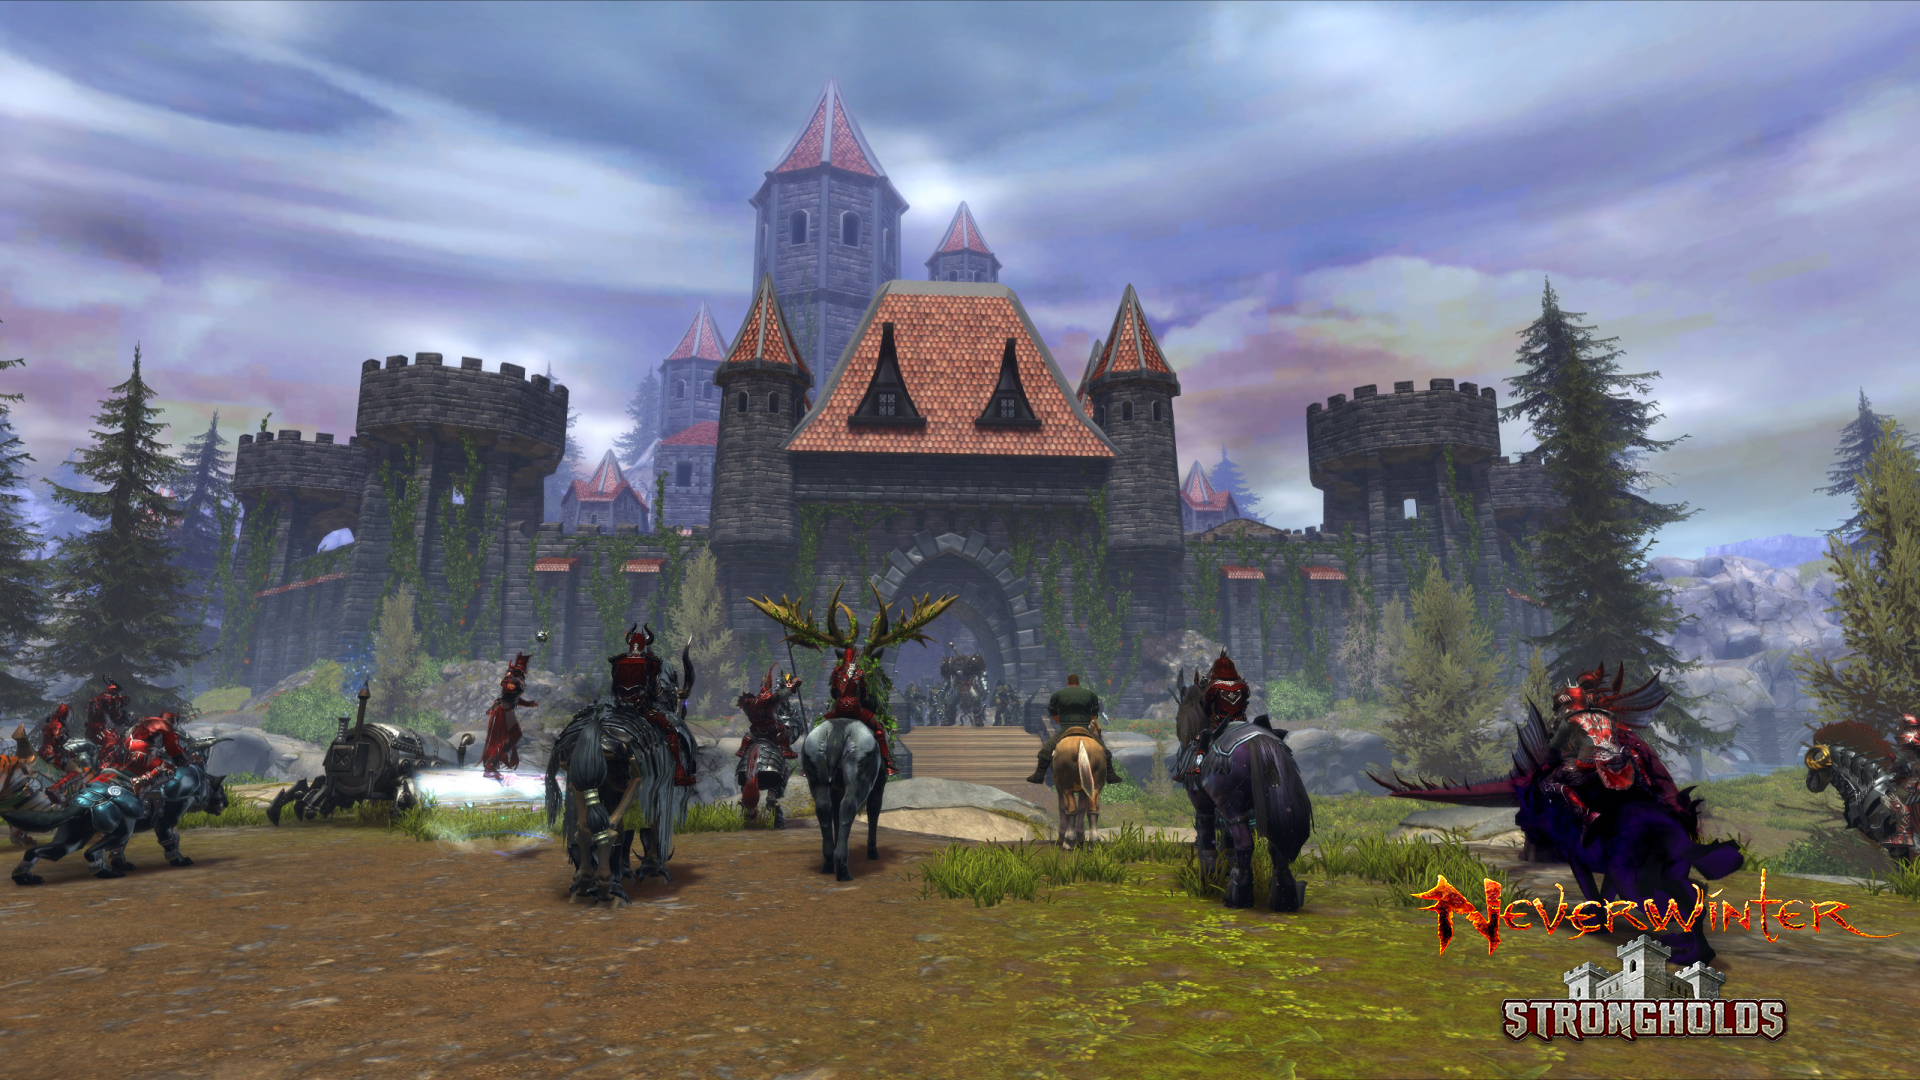 Neverwinter: Free2Play-MMO bekommt Gilden-Festungen in einem PvP-Modul